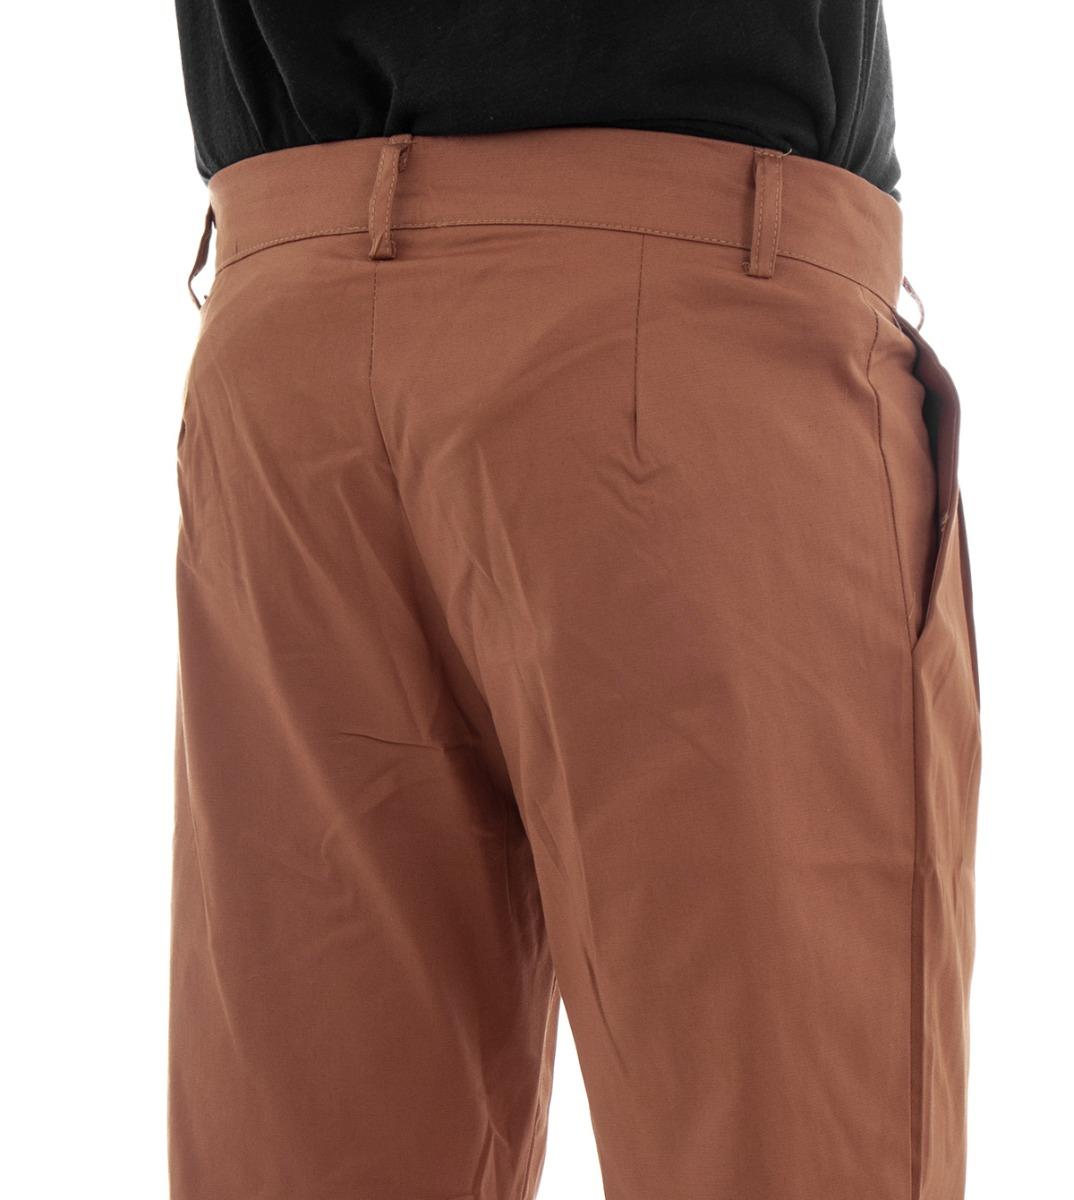 Pantalone-Uomo-Tasca-America-Mattone-Cavallo-Basso-Casual-Pence-GIOSAL miniatura 6